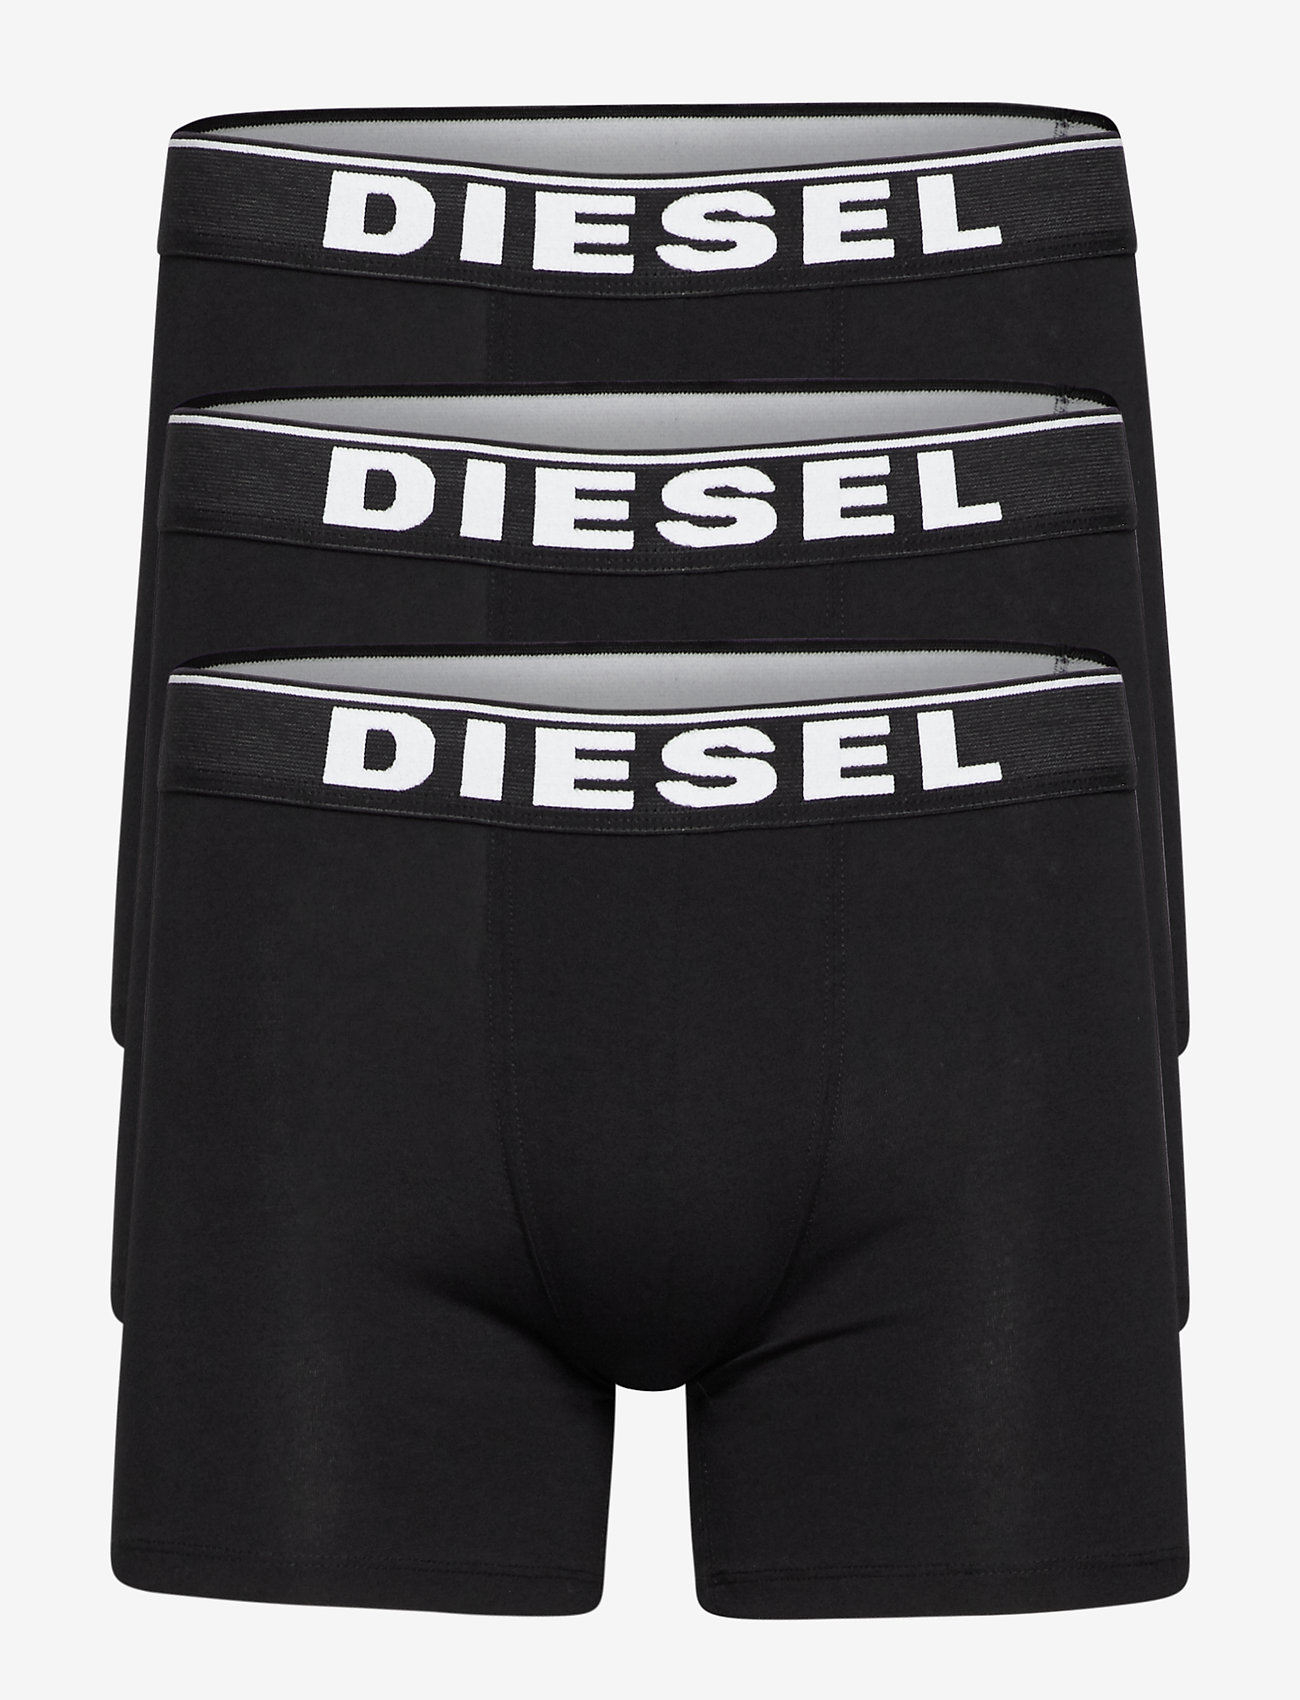 Diesel Men - UMBX-SEBASTIANTHREEPAC BOXER-SHORTS - boxers - ah900+ah900+ah900 - 0